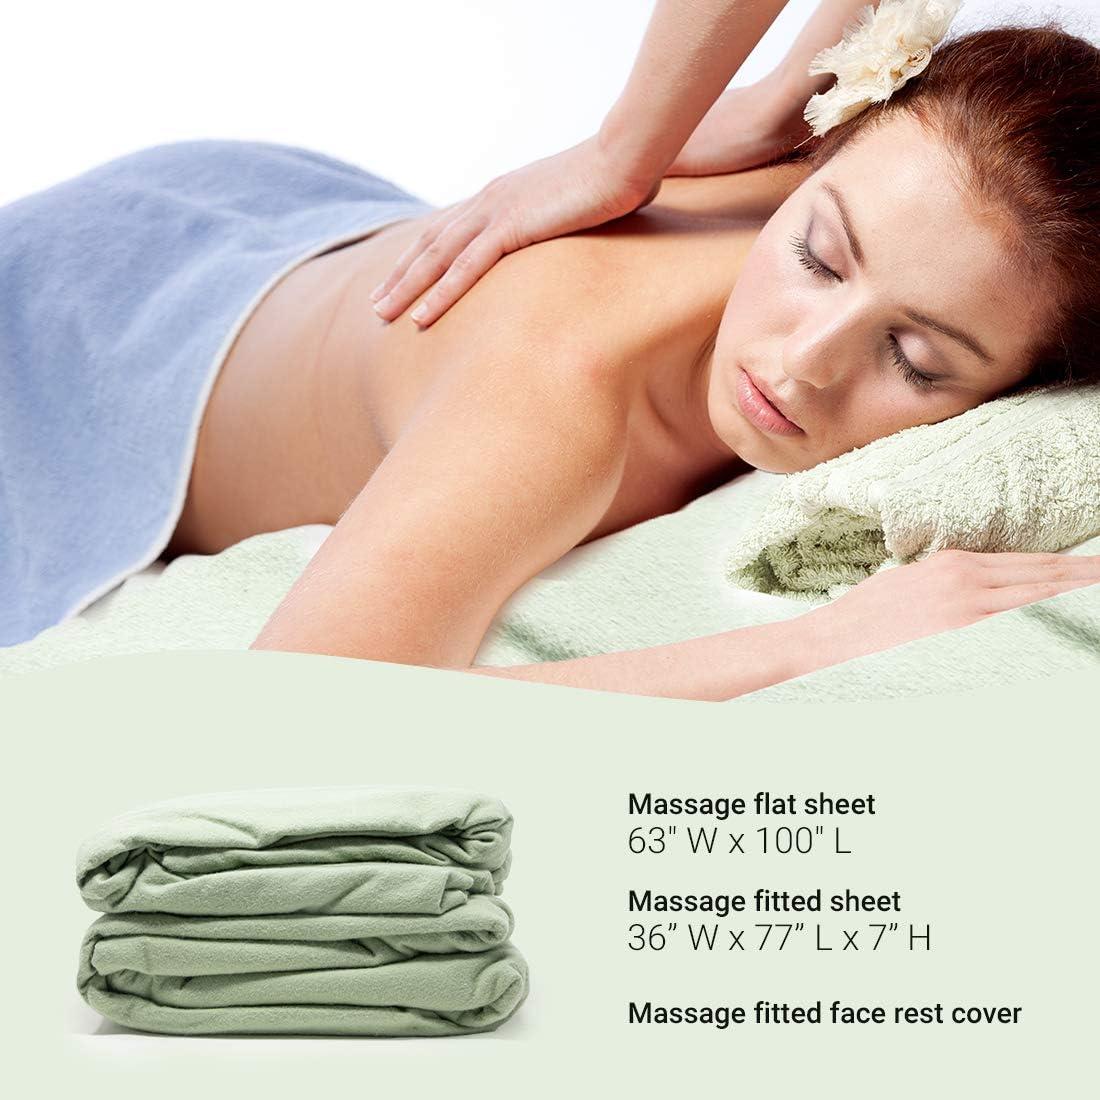 ForPro Premium Flannel 3-Piece Massage Sheet Set, Sage, for Massage Tables, Includes Massage Flat Sheet, Massage Fitted Sheet, and Massage Fitted Face Rest Cover : Massage Linens : Health & Personal Care